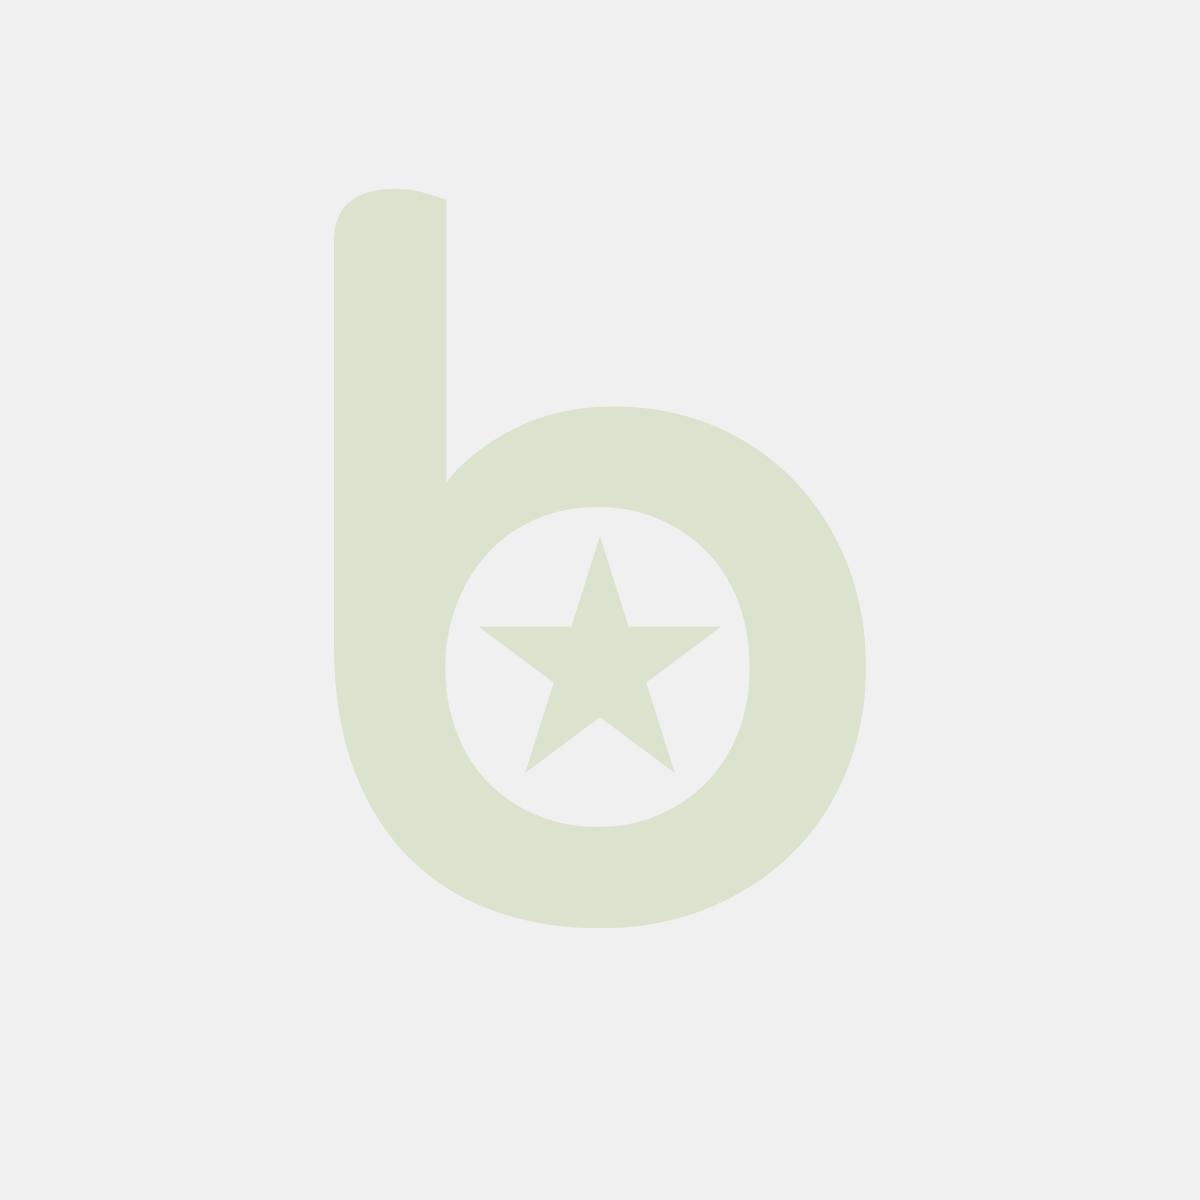 FINGERFOOD - miseczka Jomon Medium, trzcina cukrowa, 16,3x13,4x7cm, op. 15 sztuk